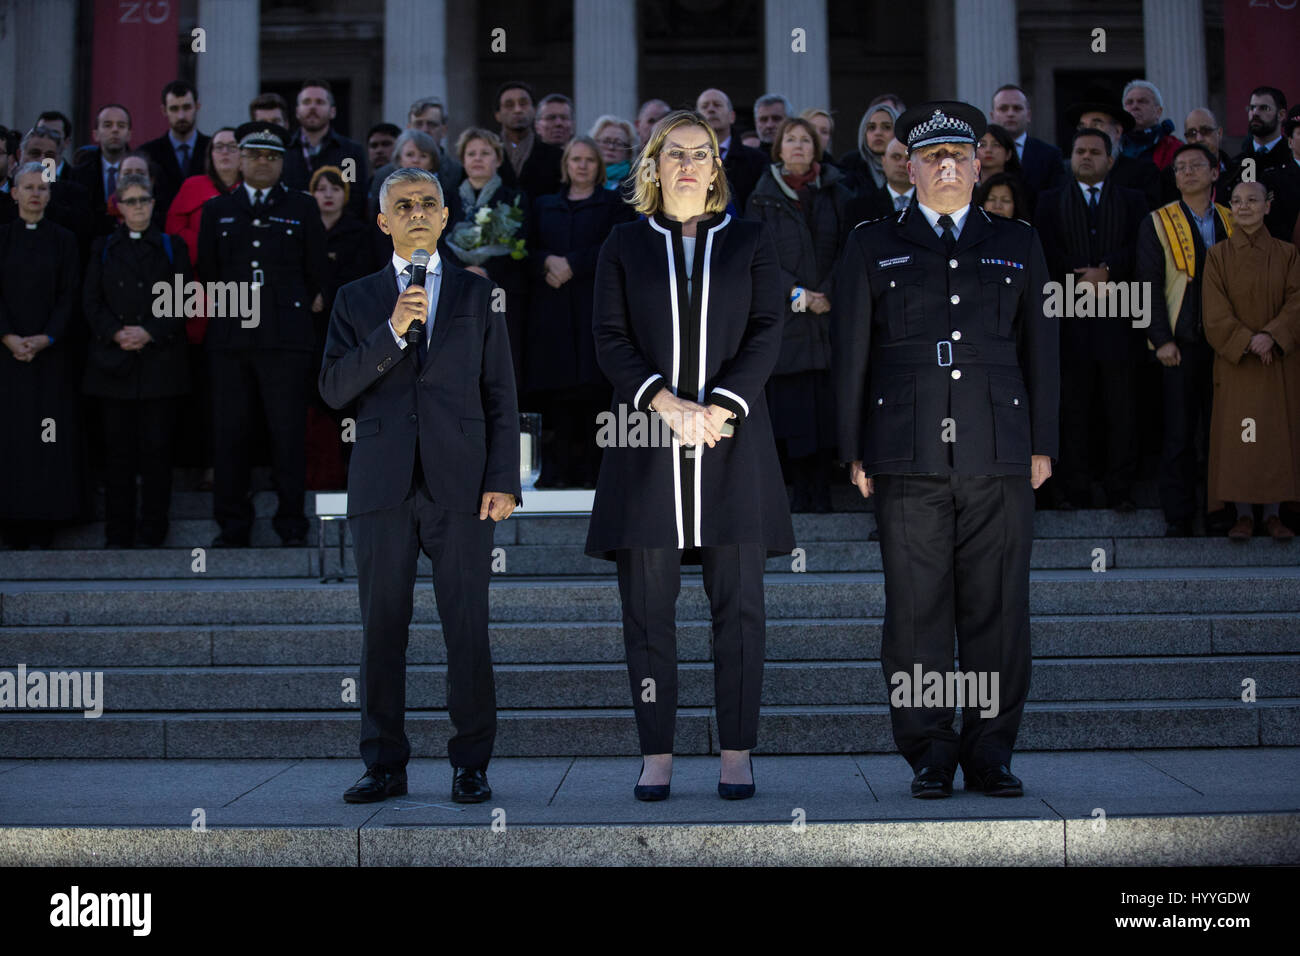 London, UK. 23rd March, 2017. Sadiq Khan, Mayor of London, addresses the vigil in Trafalgar Square for victims of - Stock Image